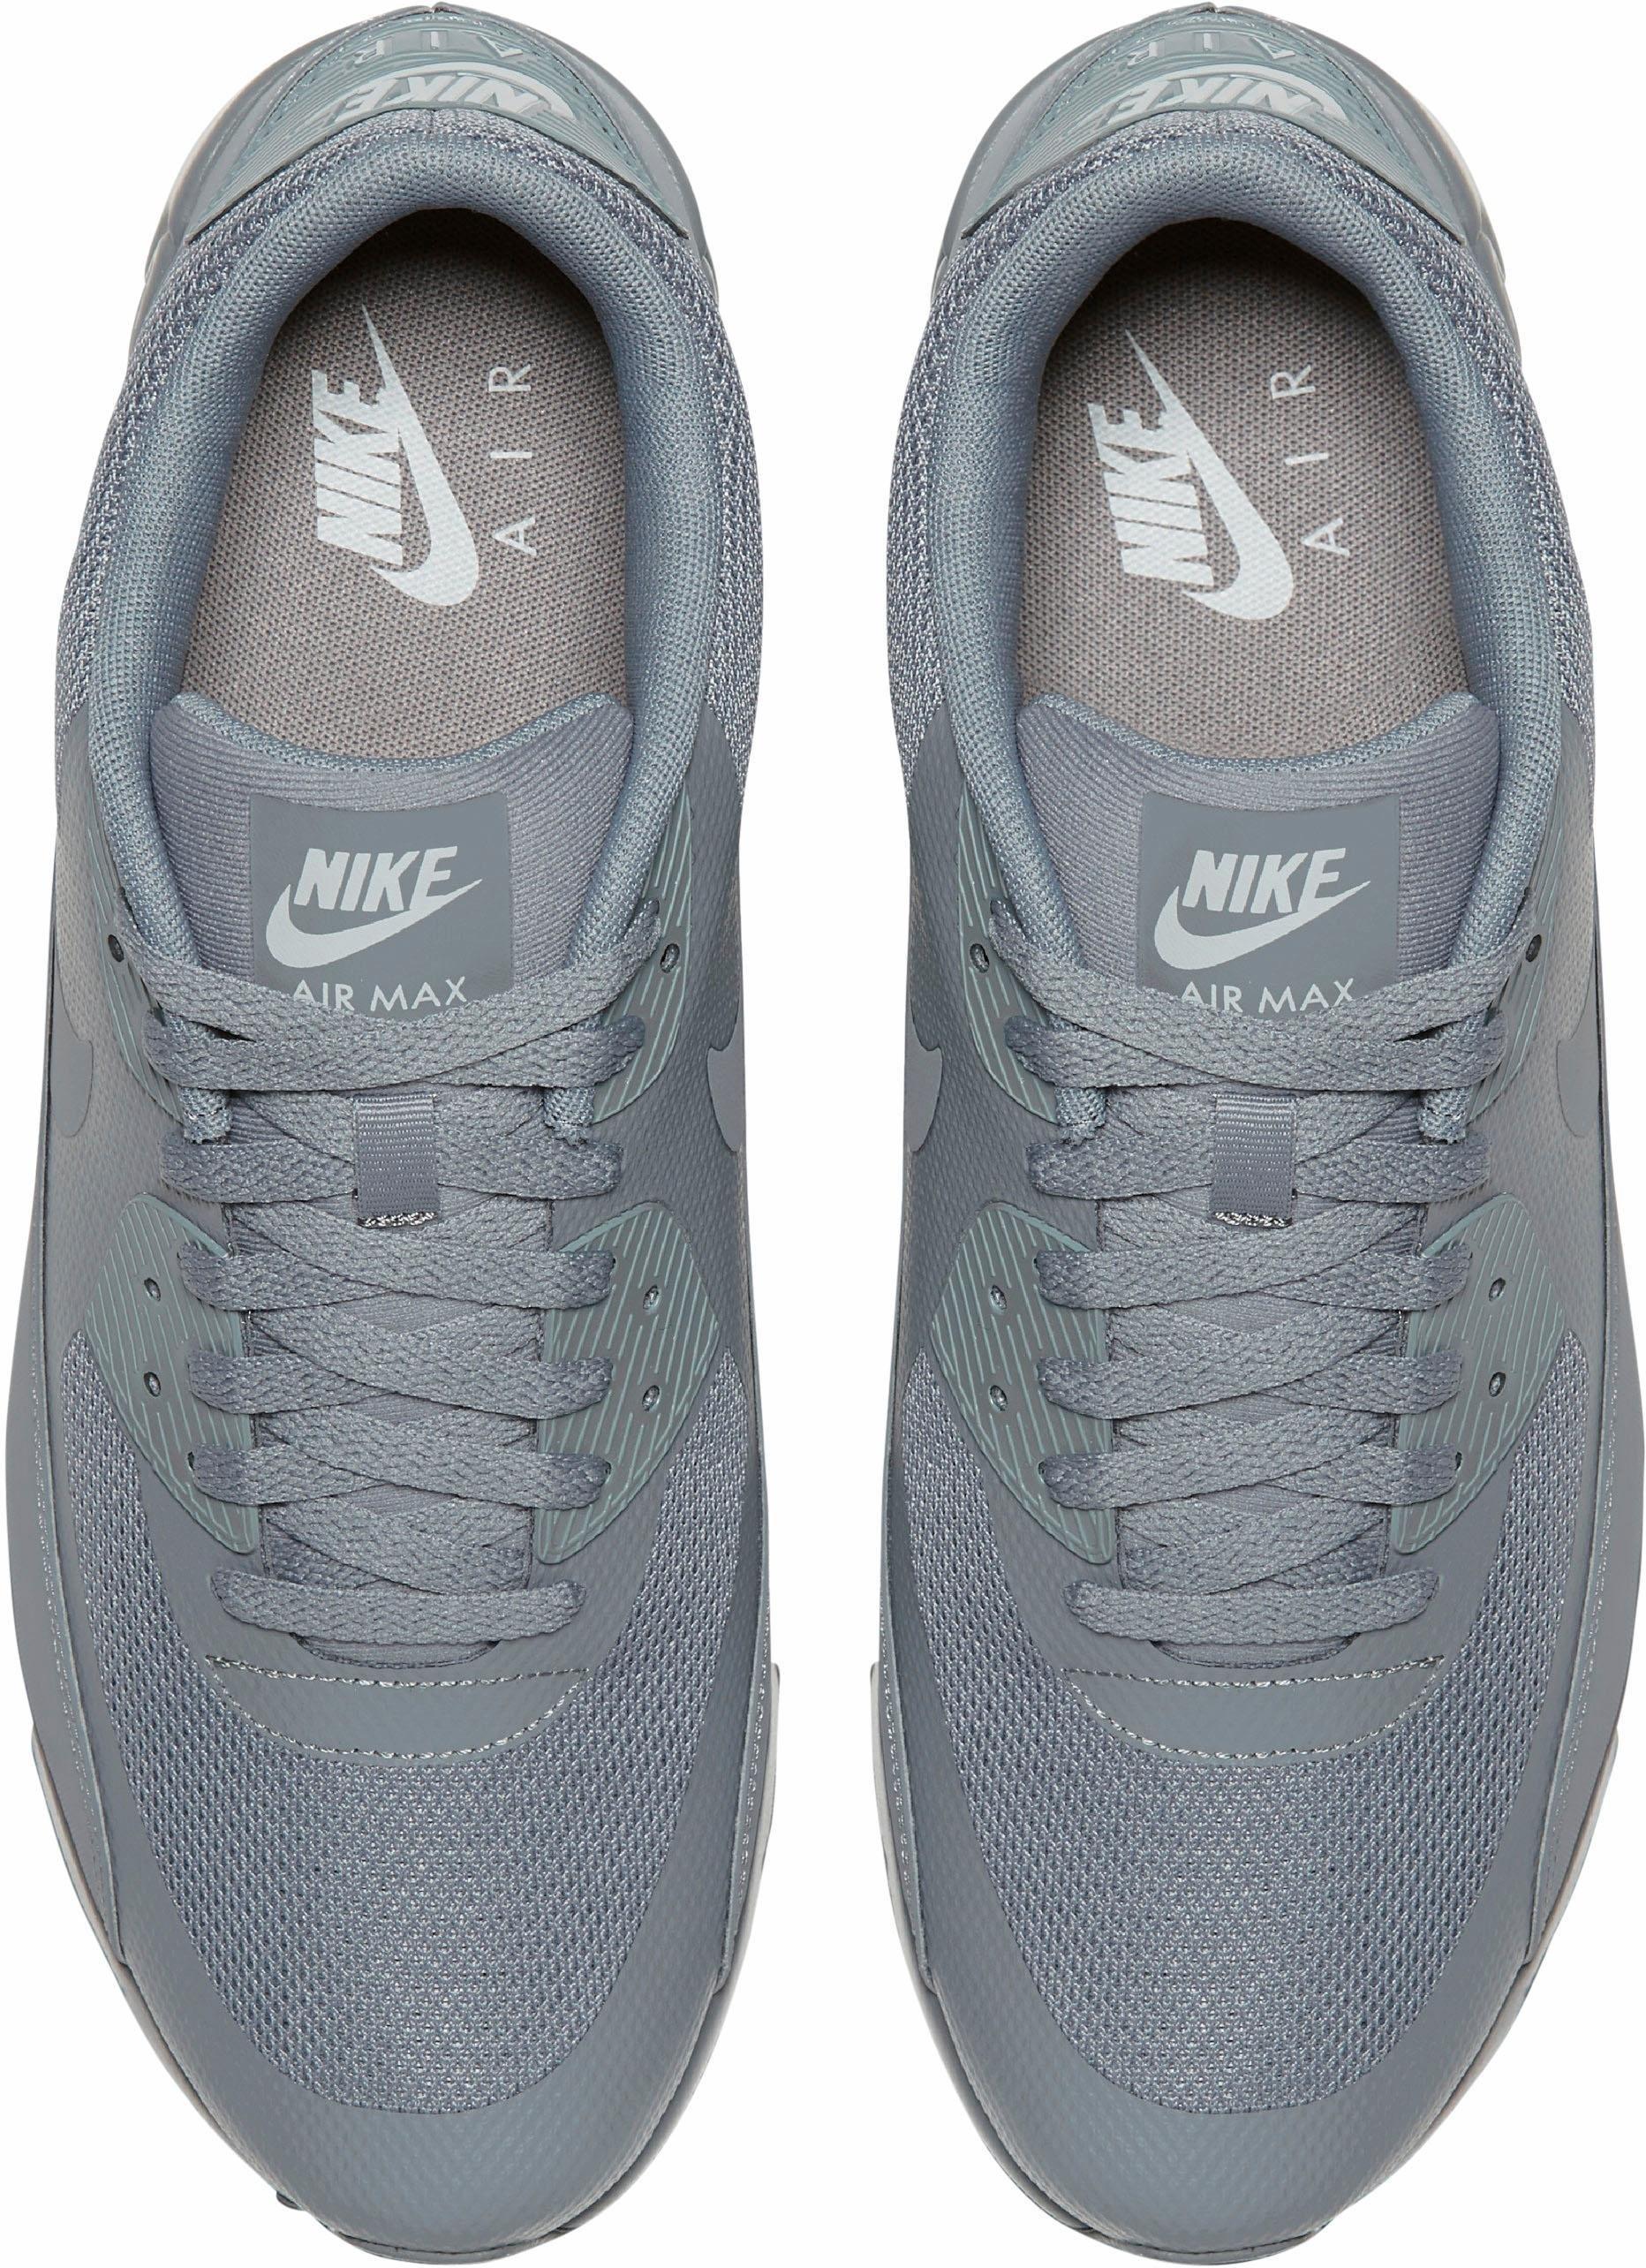 5417c4c00fb Nike Sportswear sneakers »AIR MAX 90 ULTRA 2.0 ESSENTIAL« online ...